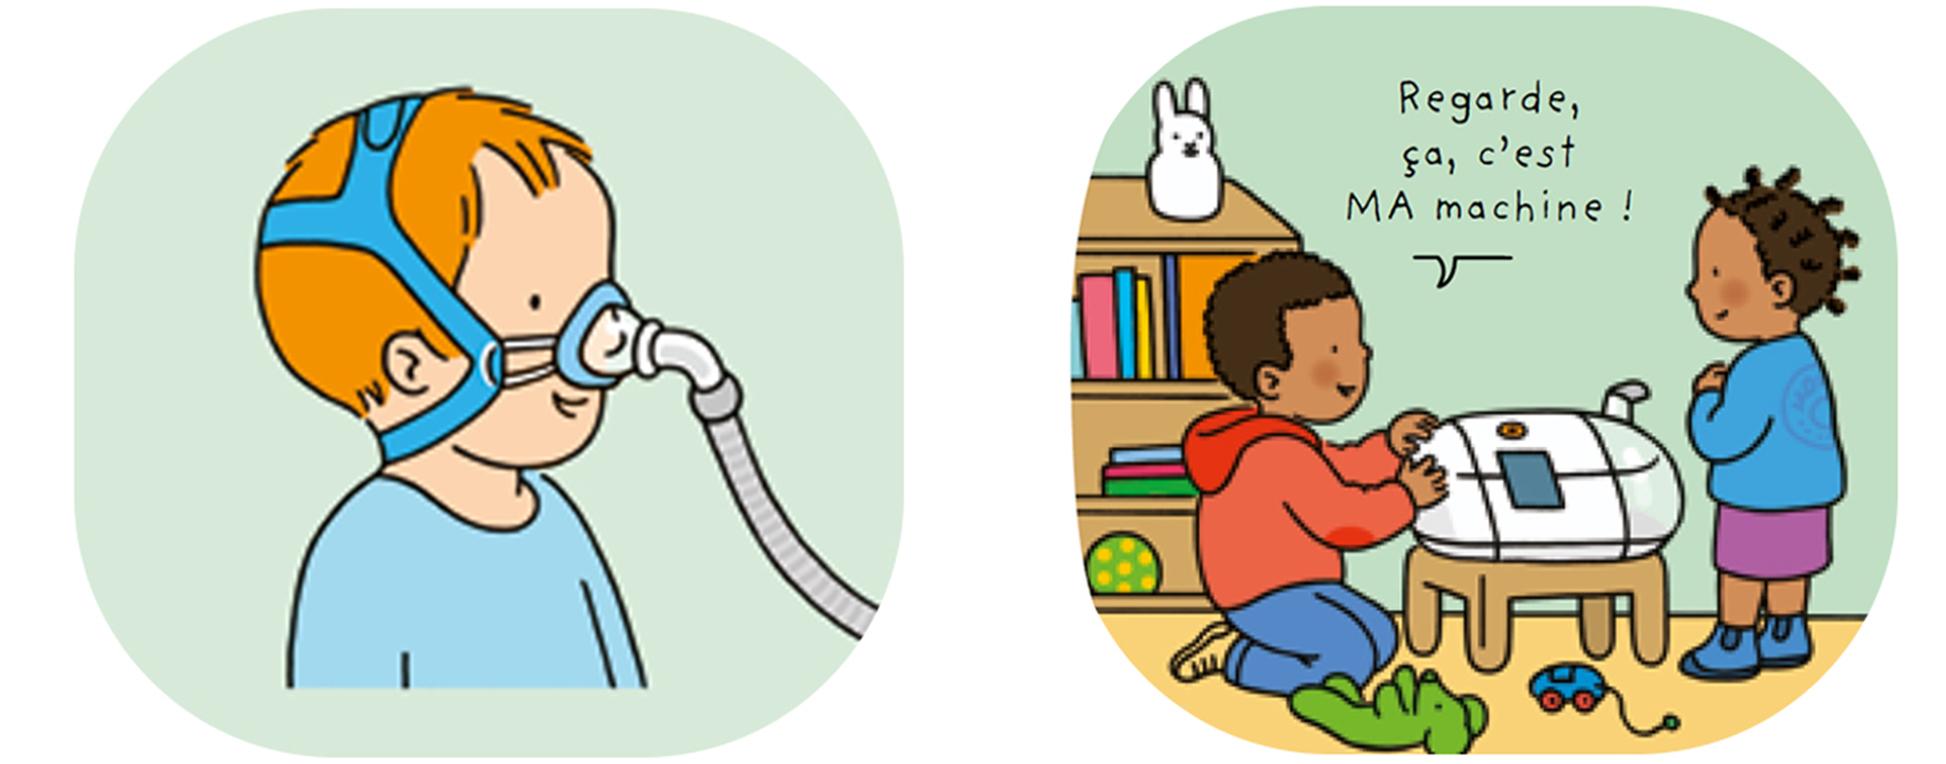 illustrations du test salivaire